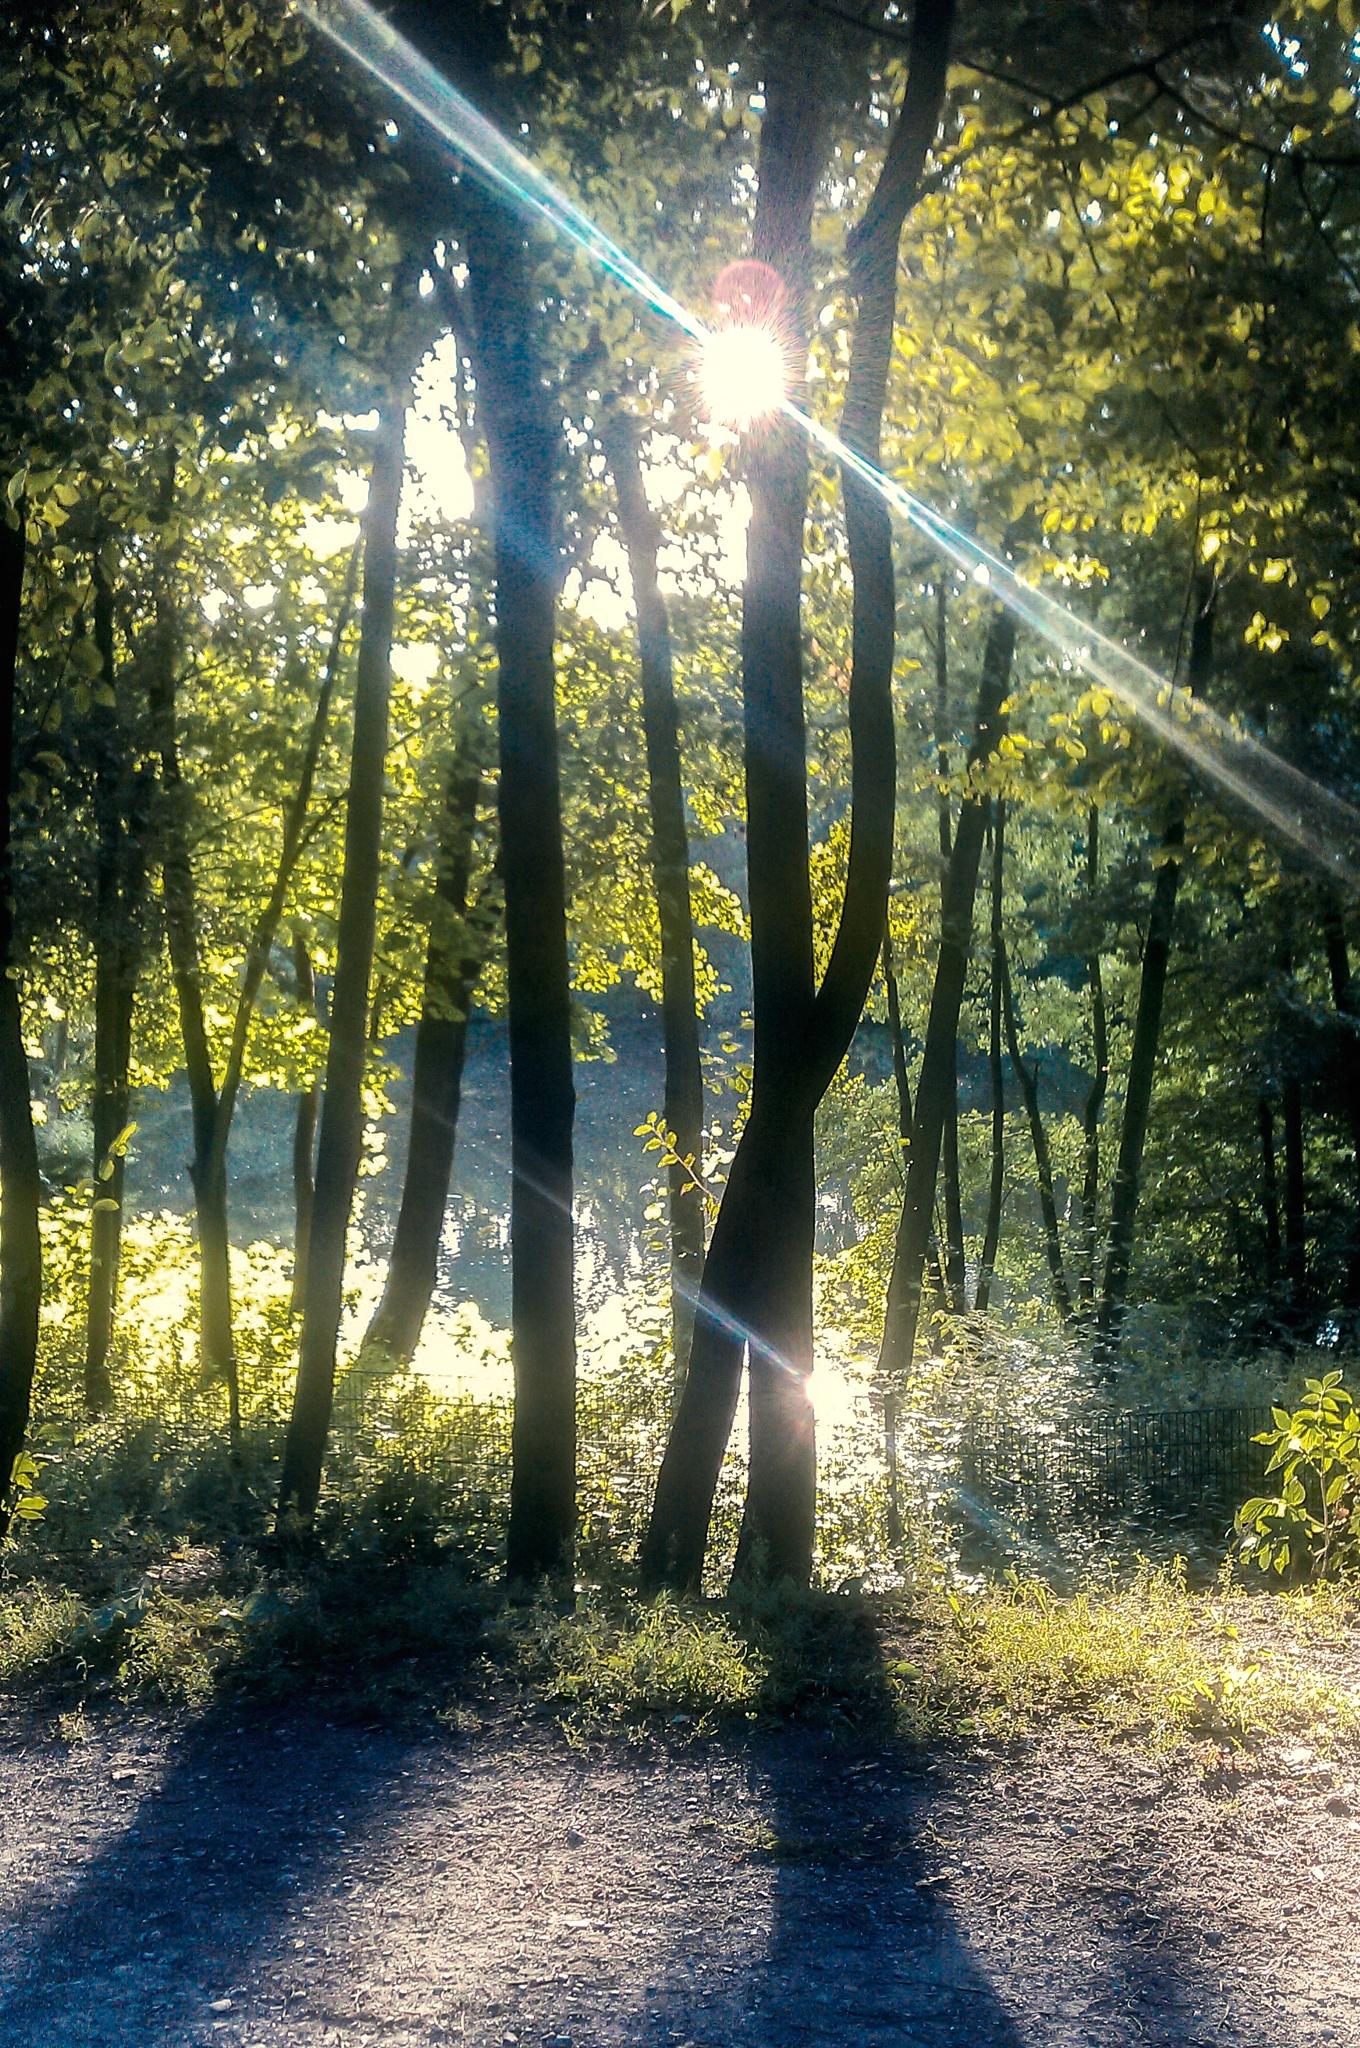 SunBeam by FoTorsten